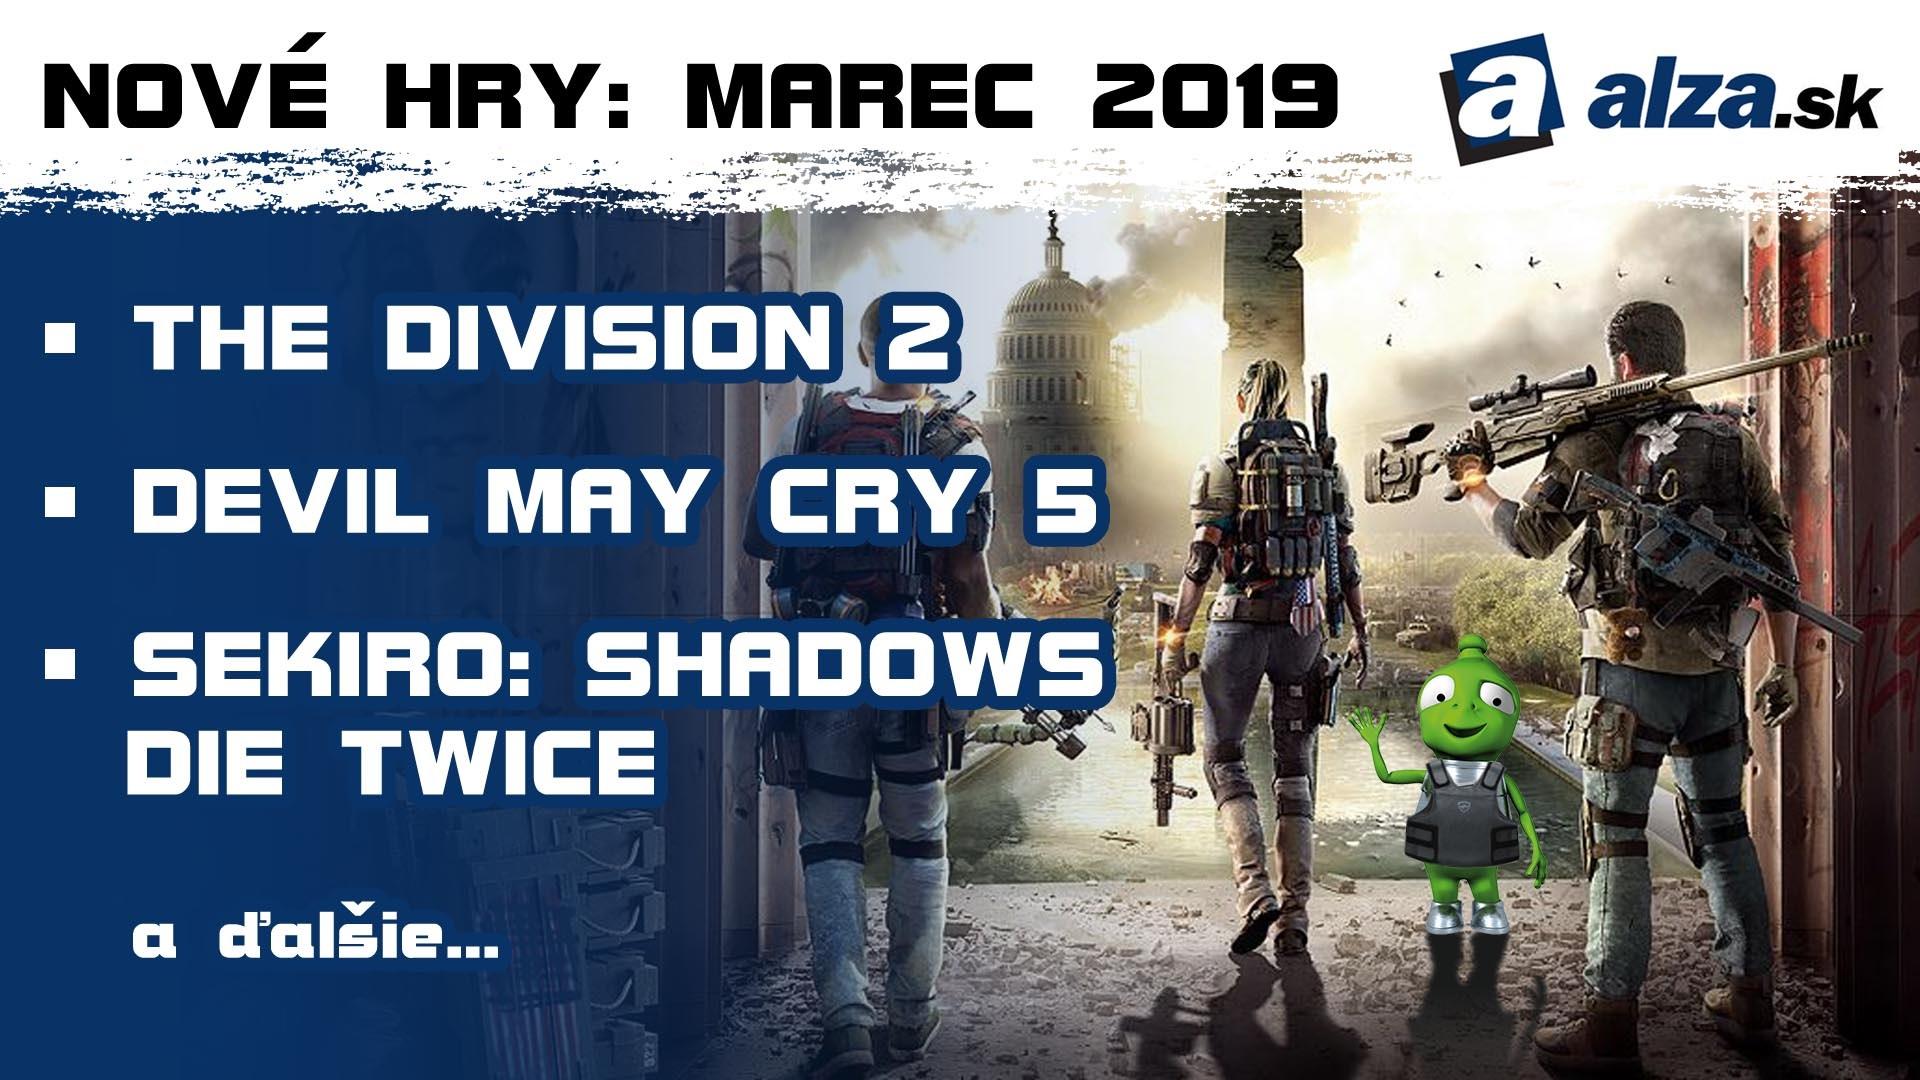 Nové hry: marec 2019 - Tom Clancy's The Division 2